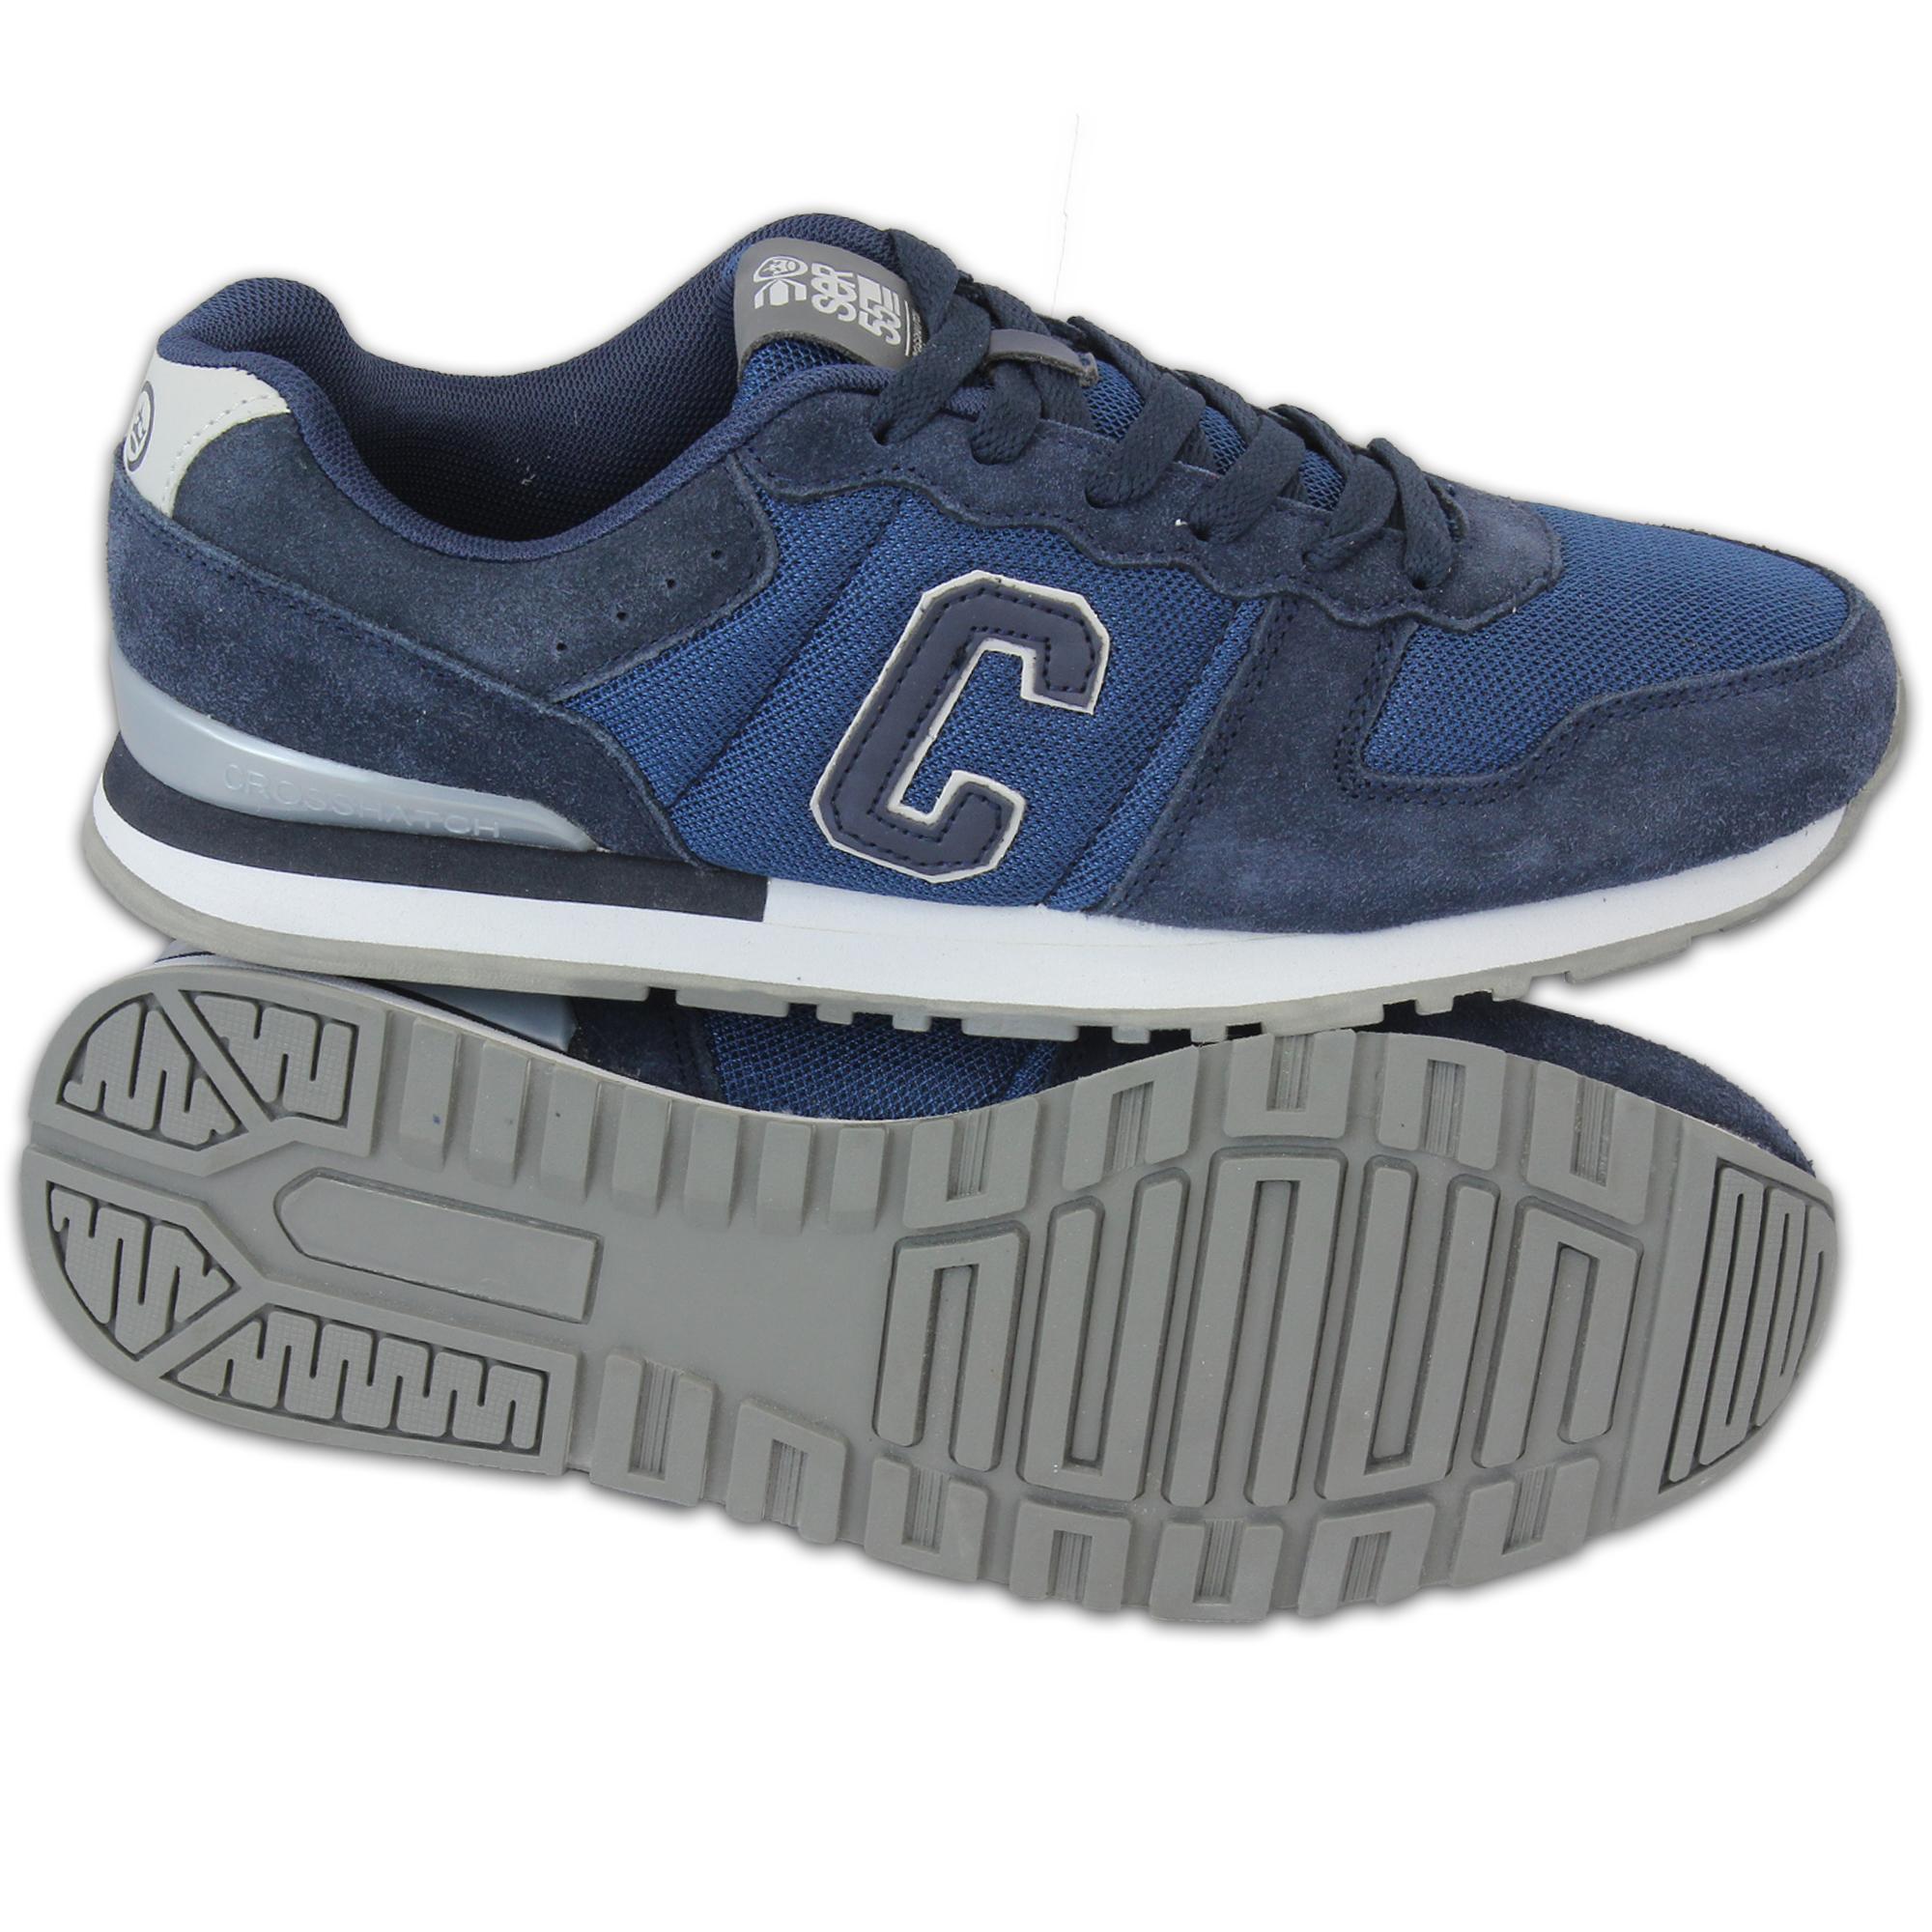 Crosshatch Shoes Black Label